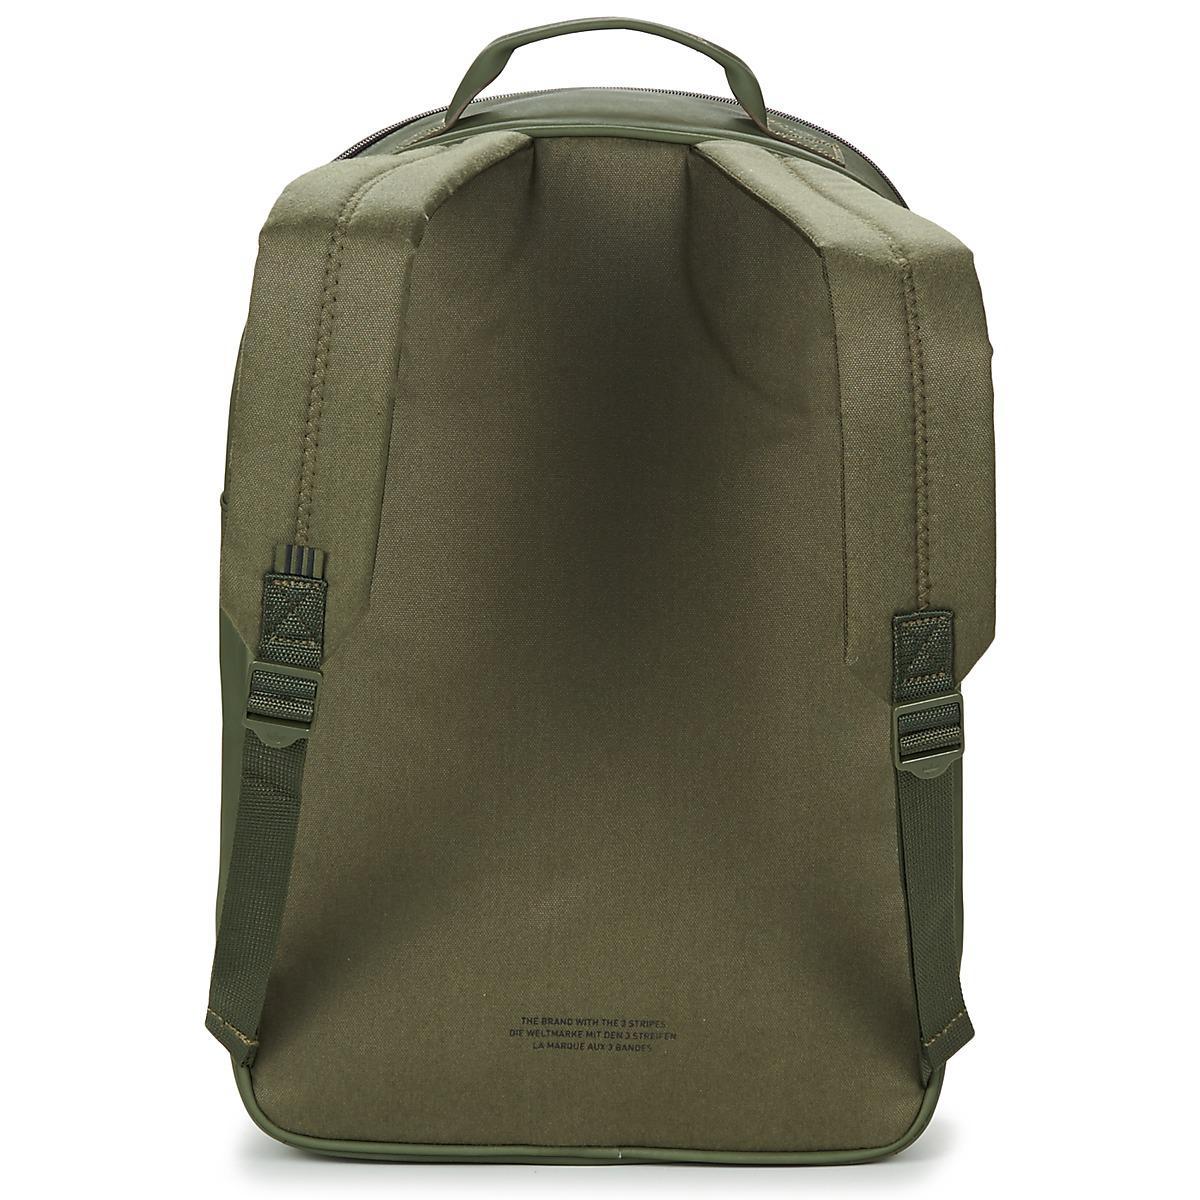 Adidas - Bp Classic Women s Backpack In Green for Men - Lyst. View  fullscreen 7594224545eb3